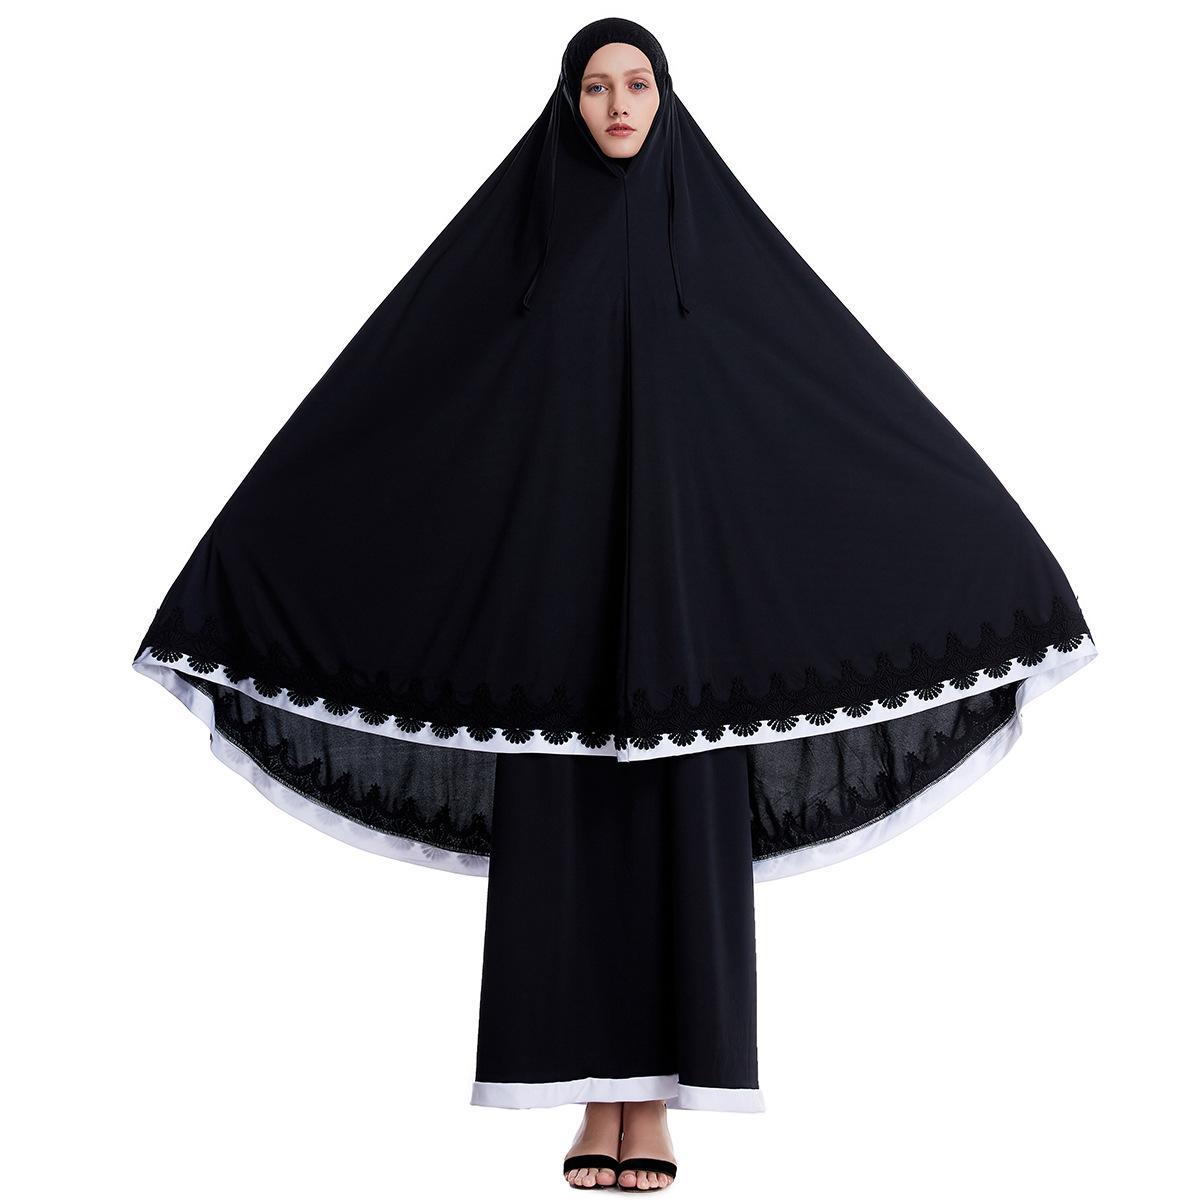 Kalenmos Ramadan Muslim Prayer Garment Women 2 Piece Set Khimar Abaya Hijab Skirt Full Cover Islam Clothes Burka Niqab Worship